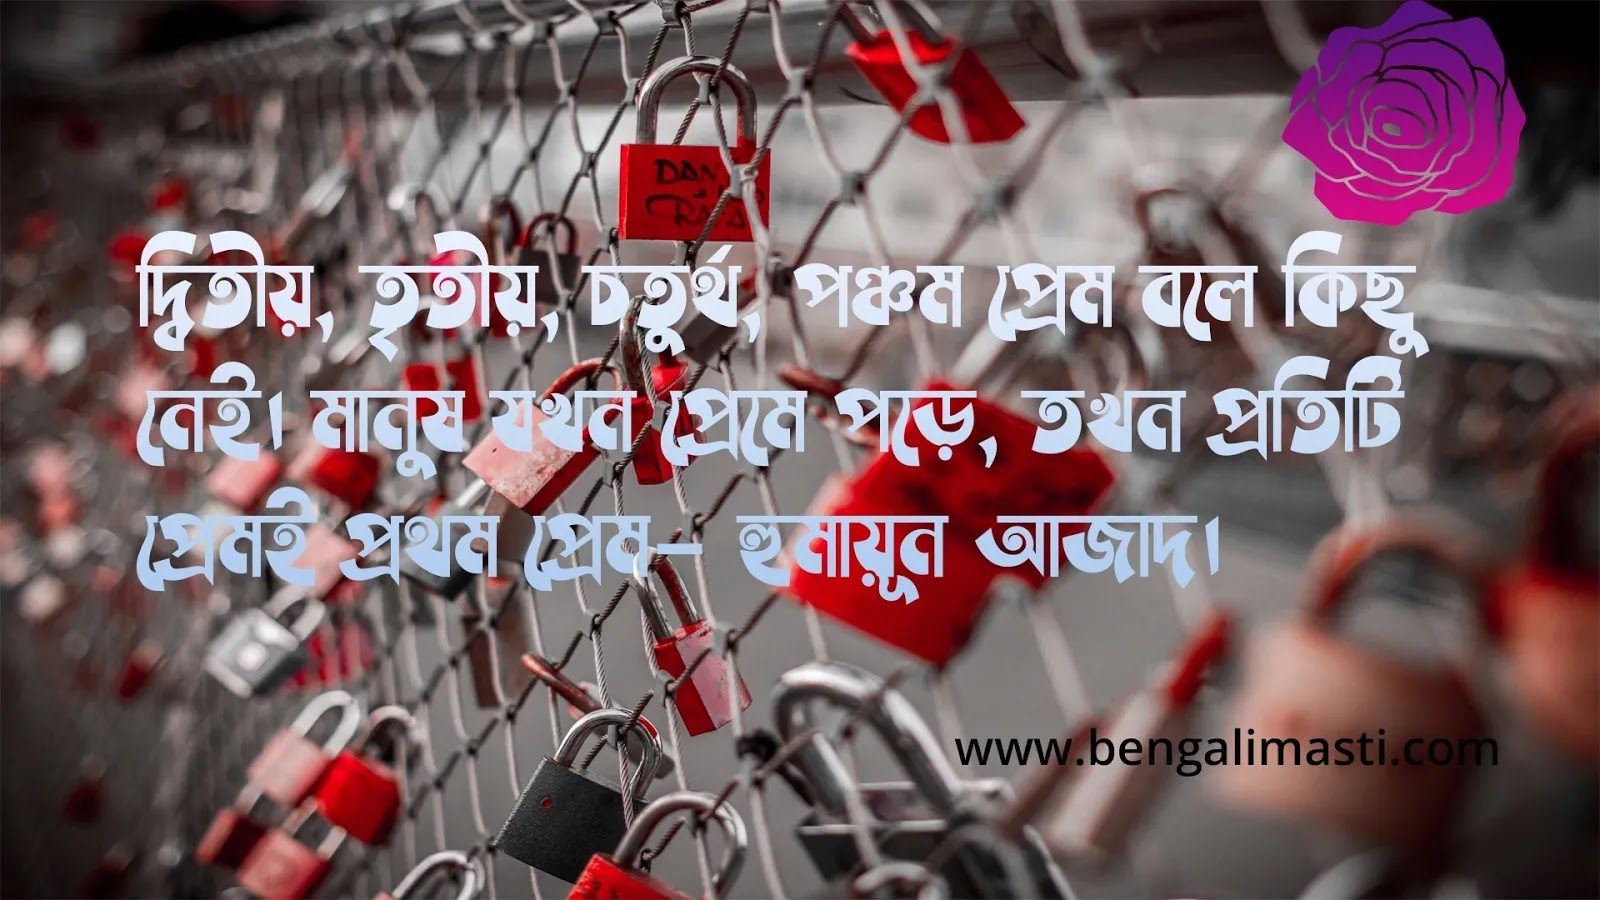 bengali sad quotes on love